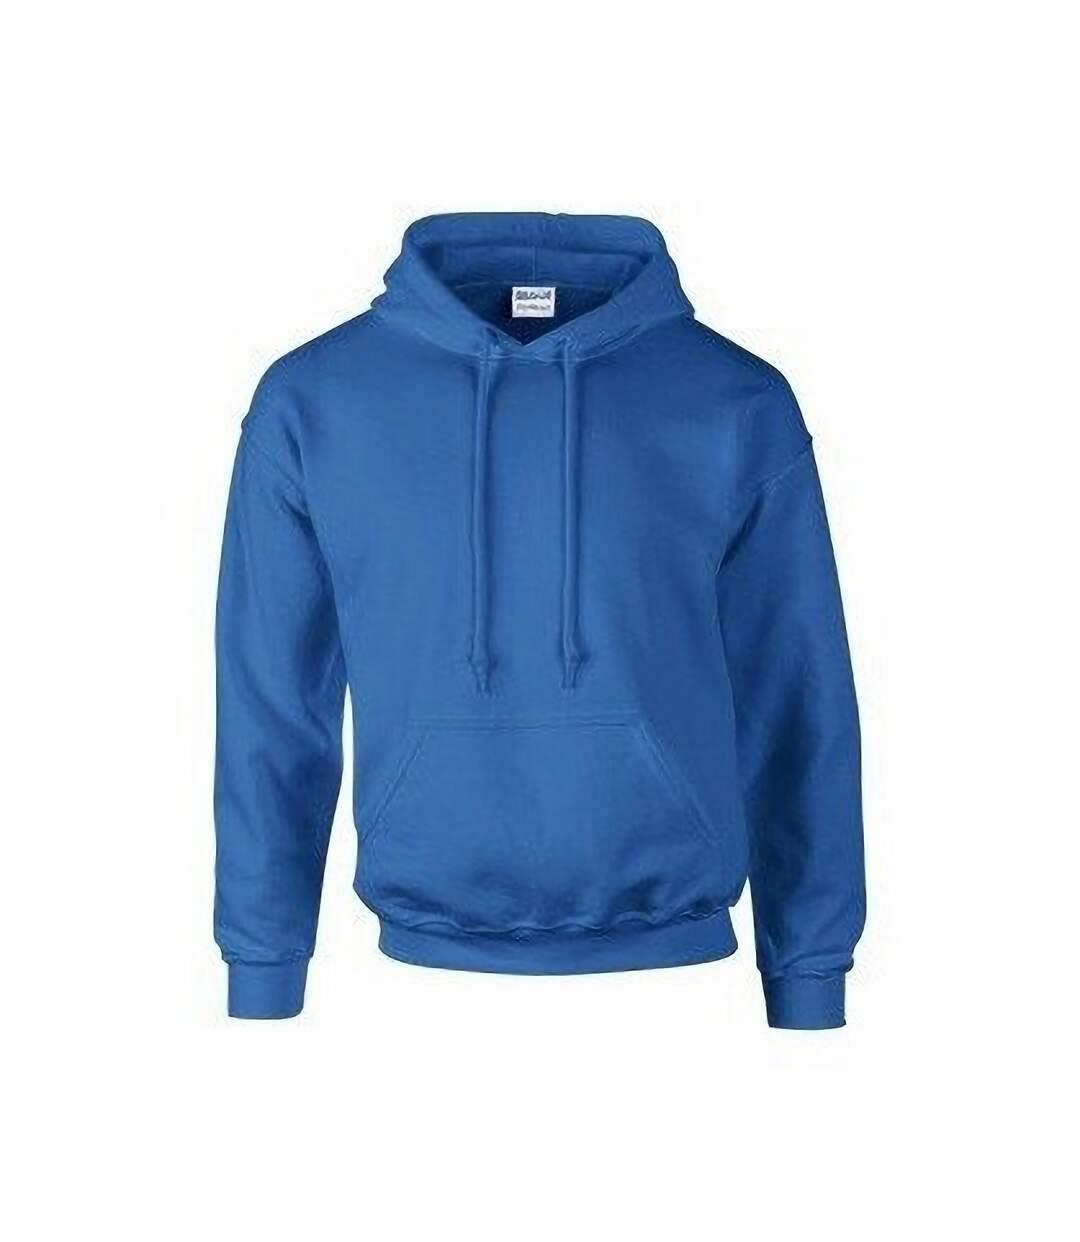 Gildan Heavyweight DryBlend Adult Unisex Hooded Sweatshirt Top / Hoodie (13 Colours) (Cardinal) - UTBC461